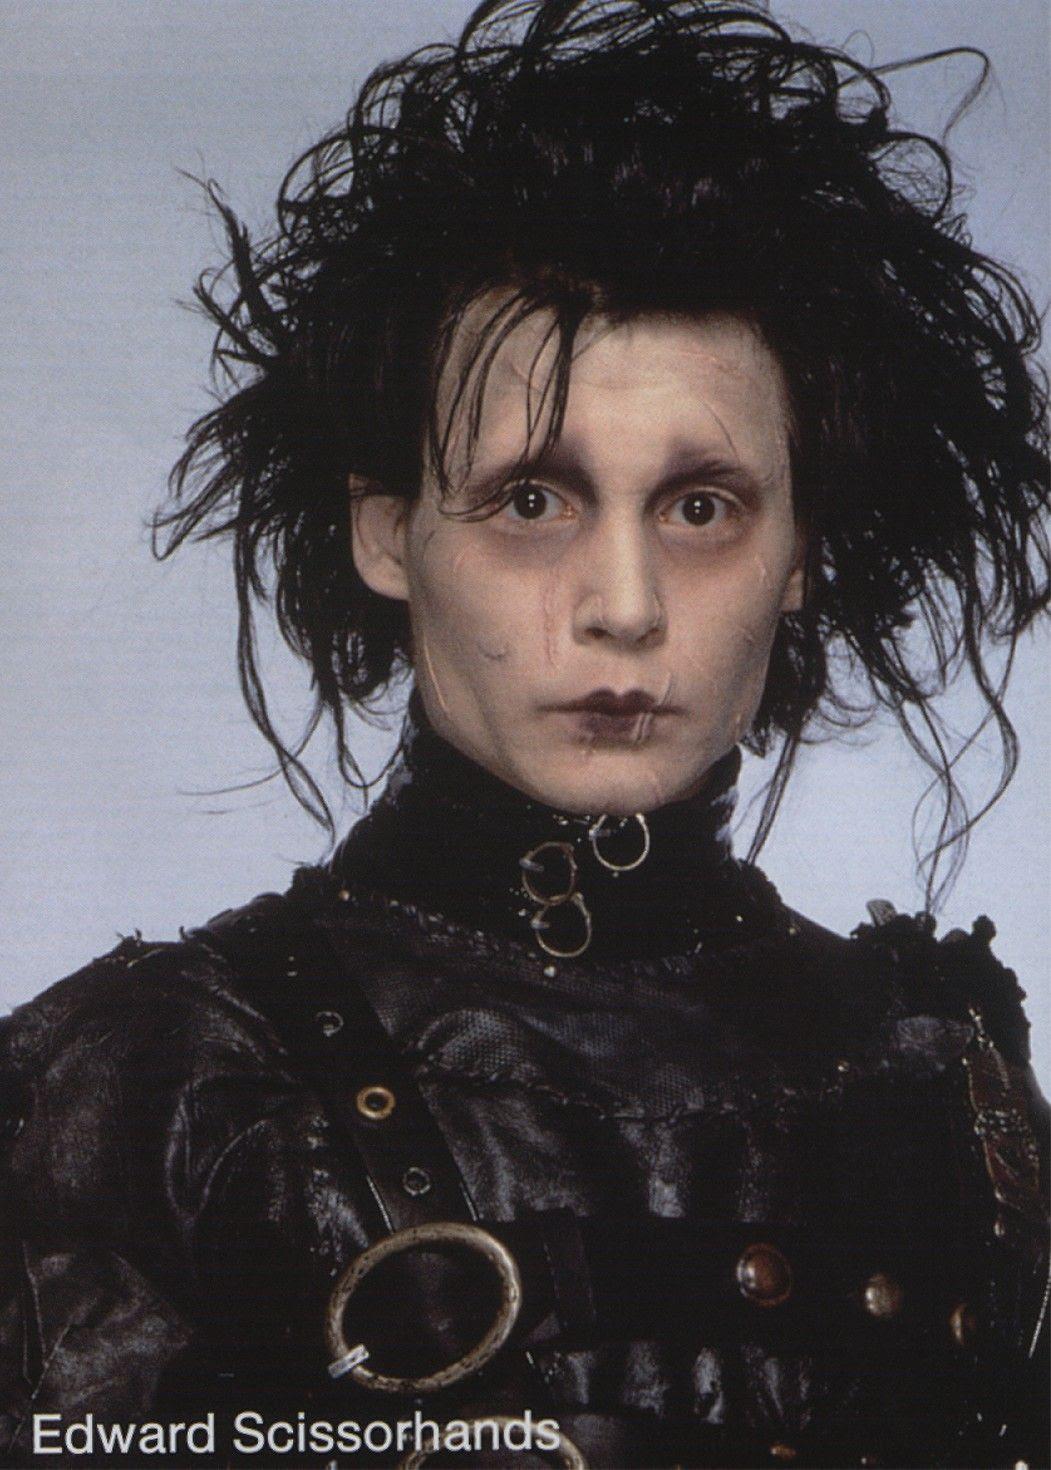 Edward Scissorhands Johnny Depp Photo 180749 Fanpop